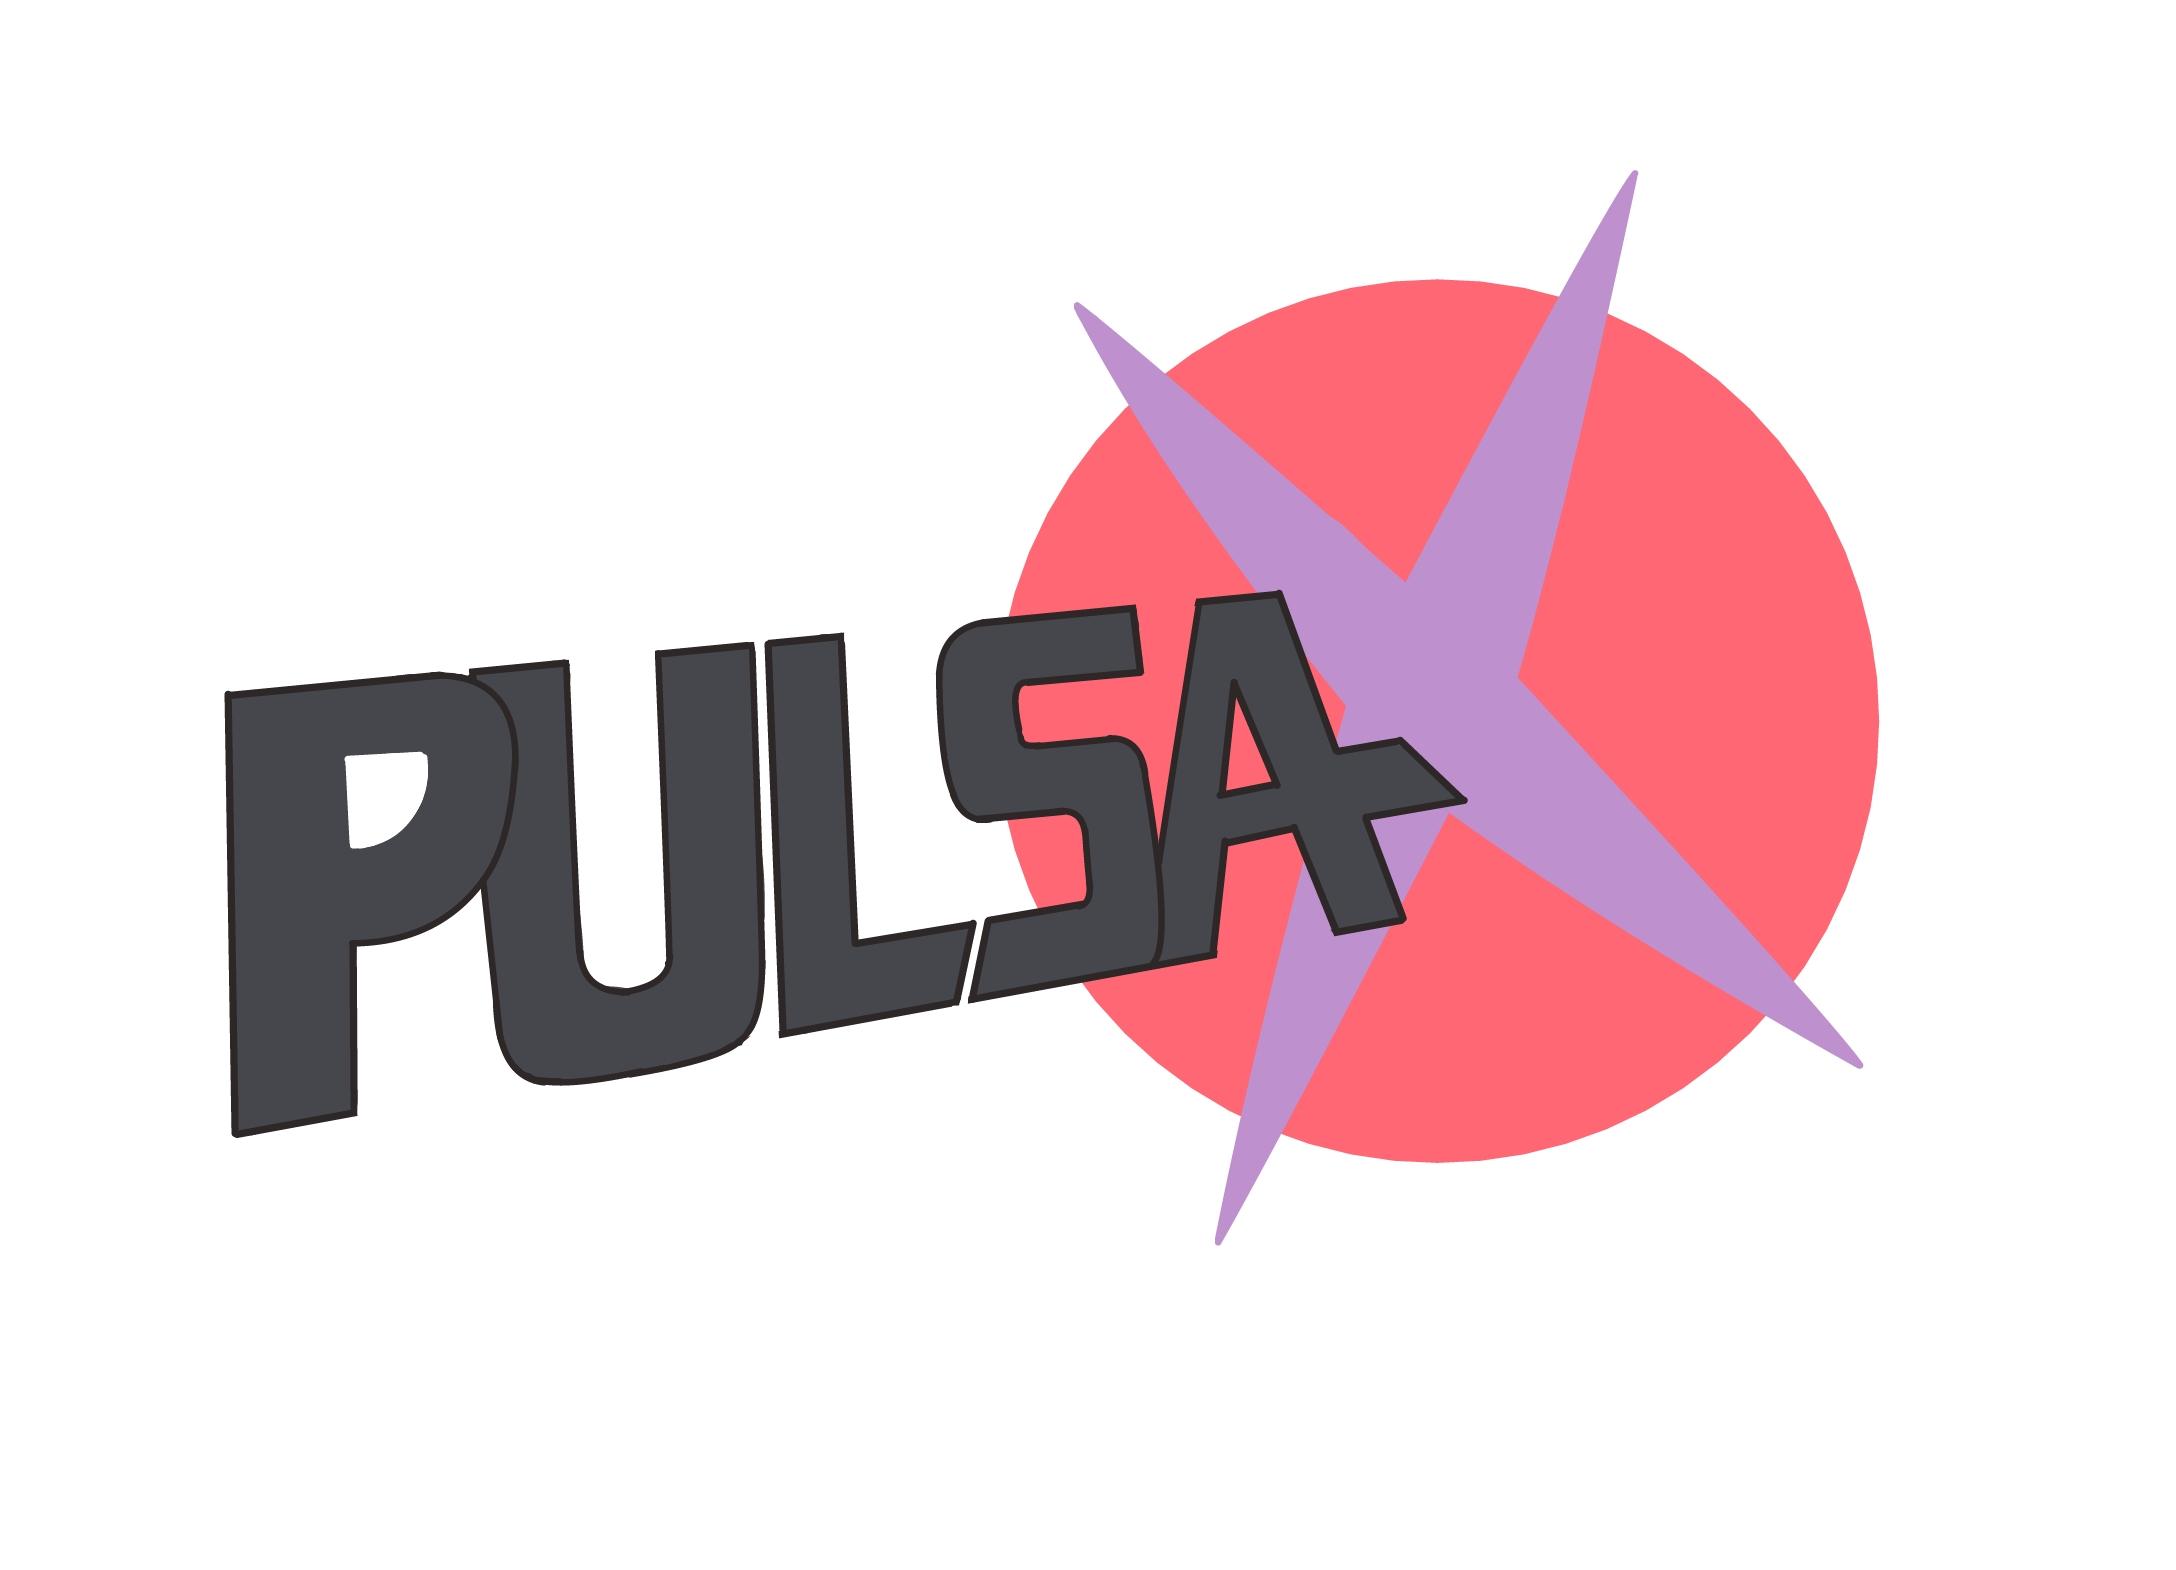 PULSAX-PROGRAMA14